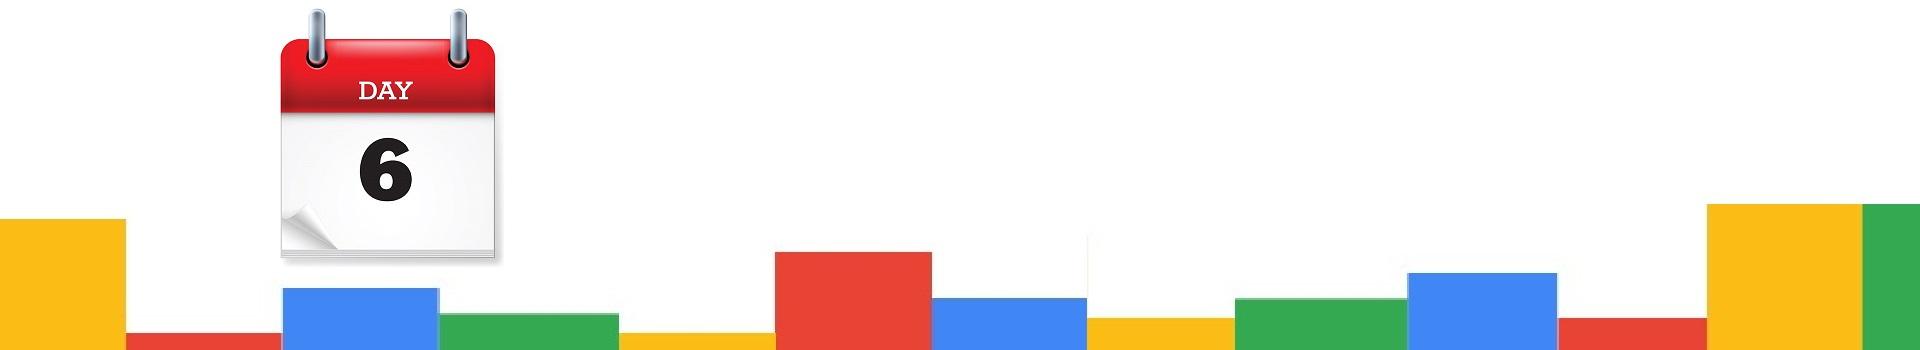 Google Day 6